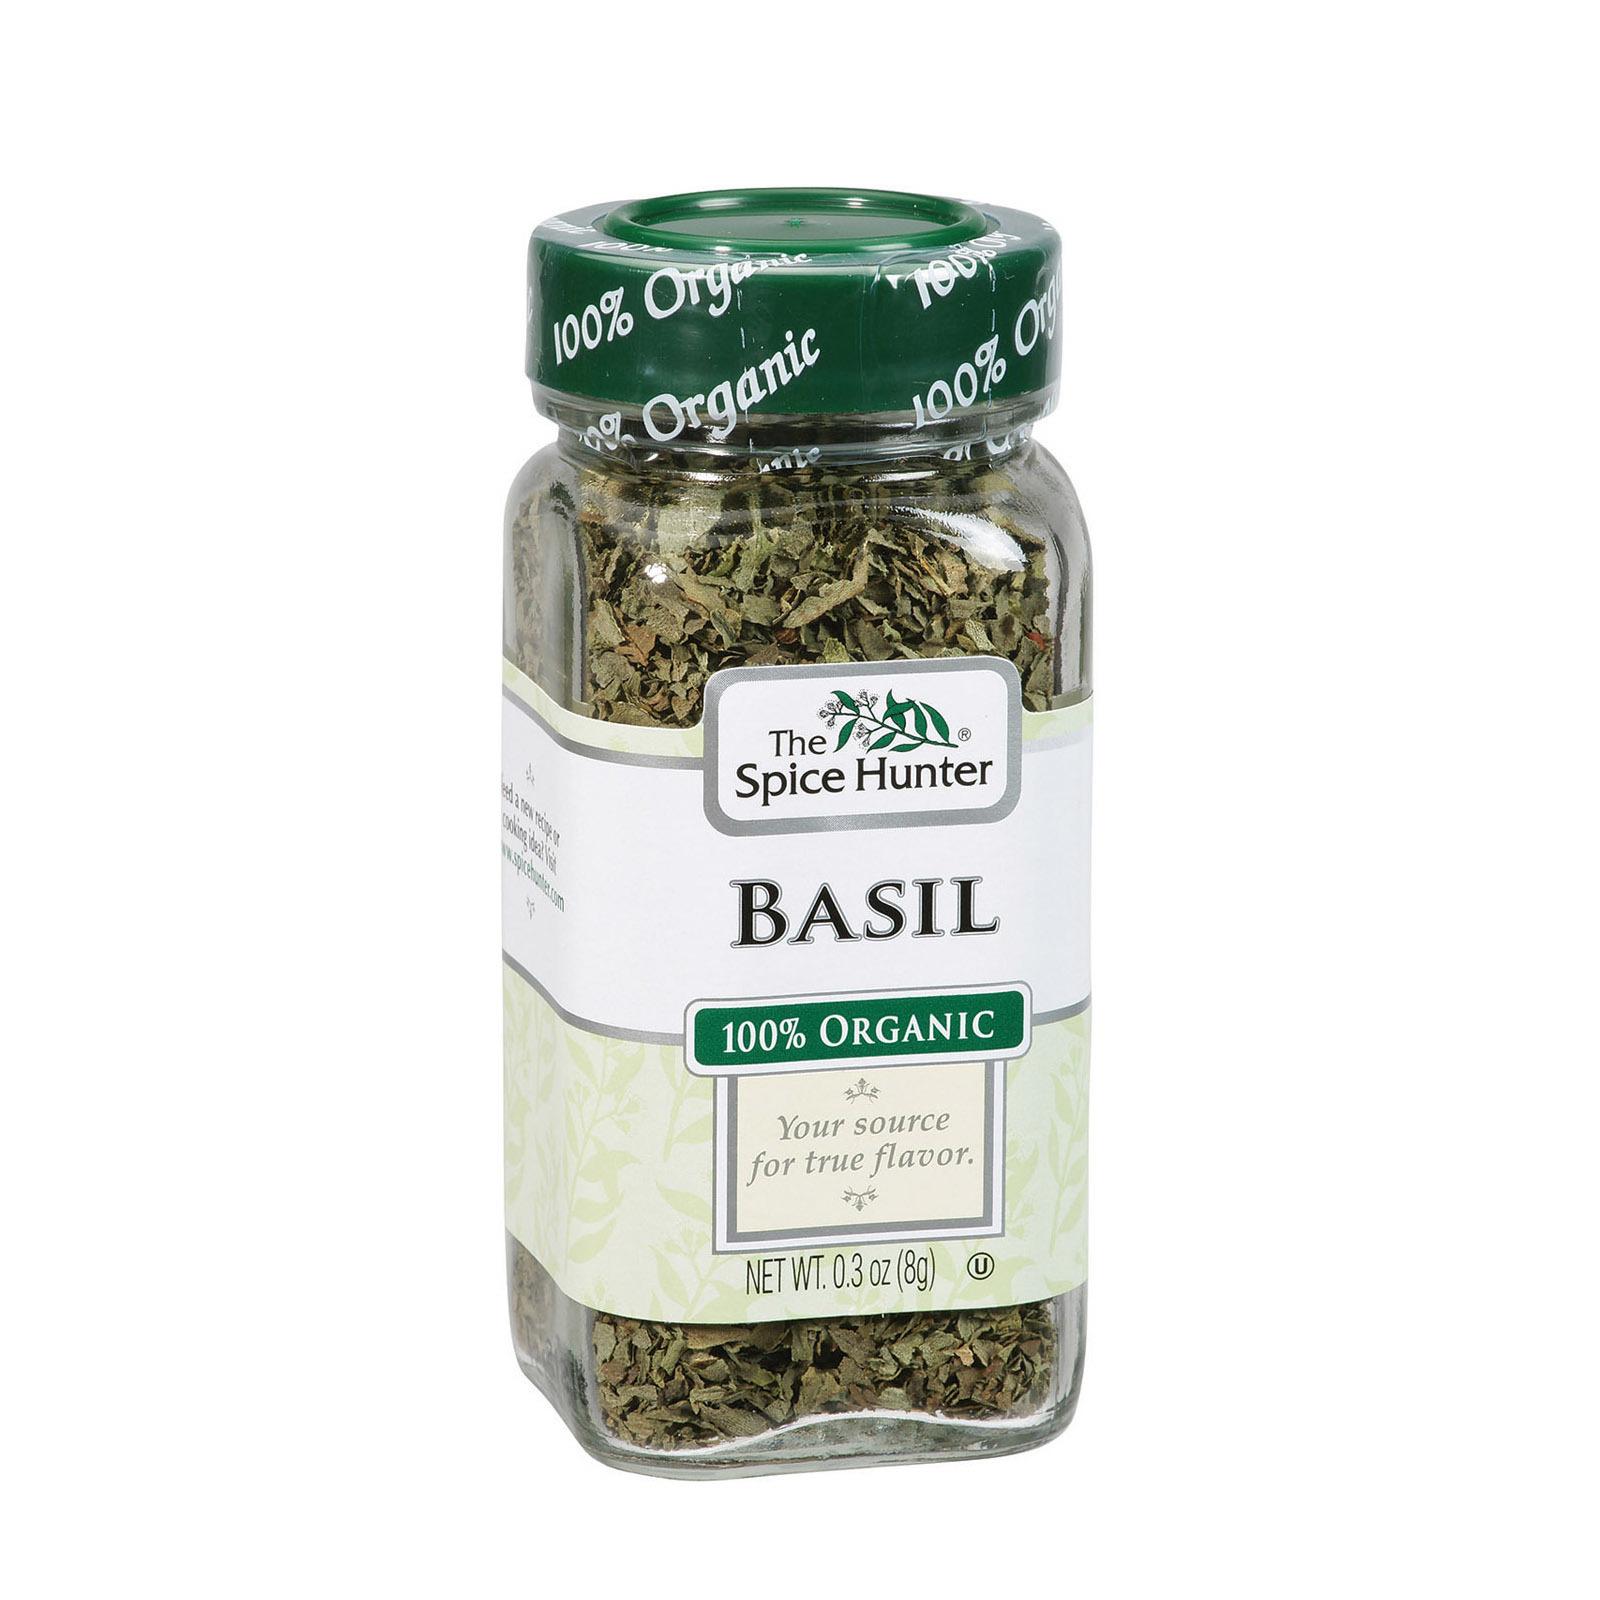 Spice Hunter 100% Organic Spice - Basil - Case of 6 - .3 oz